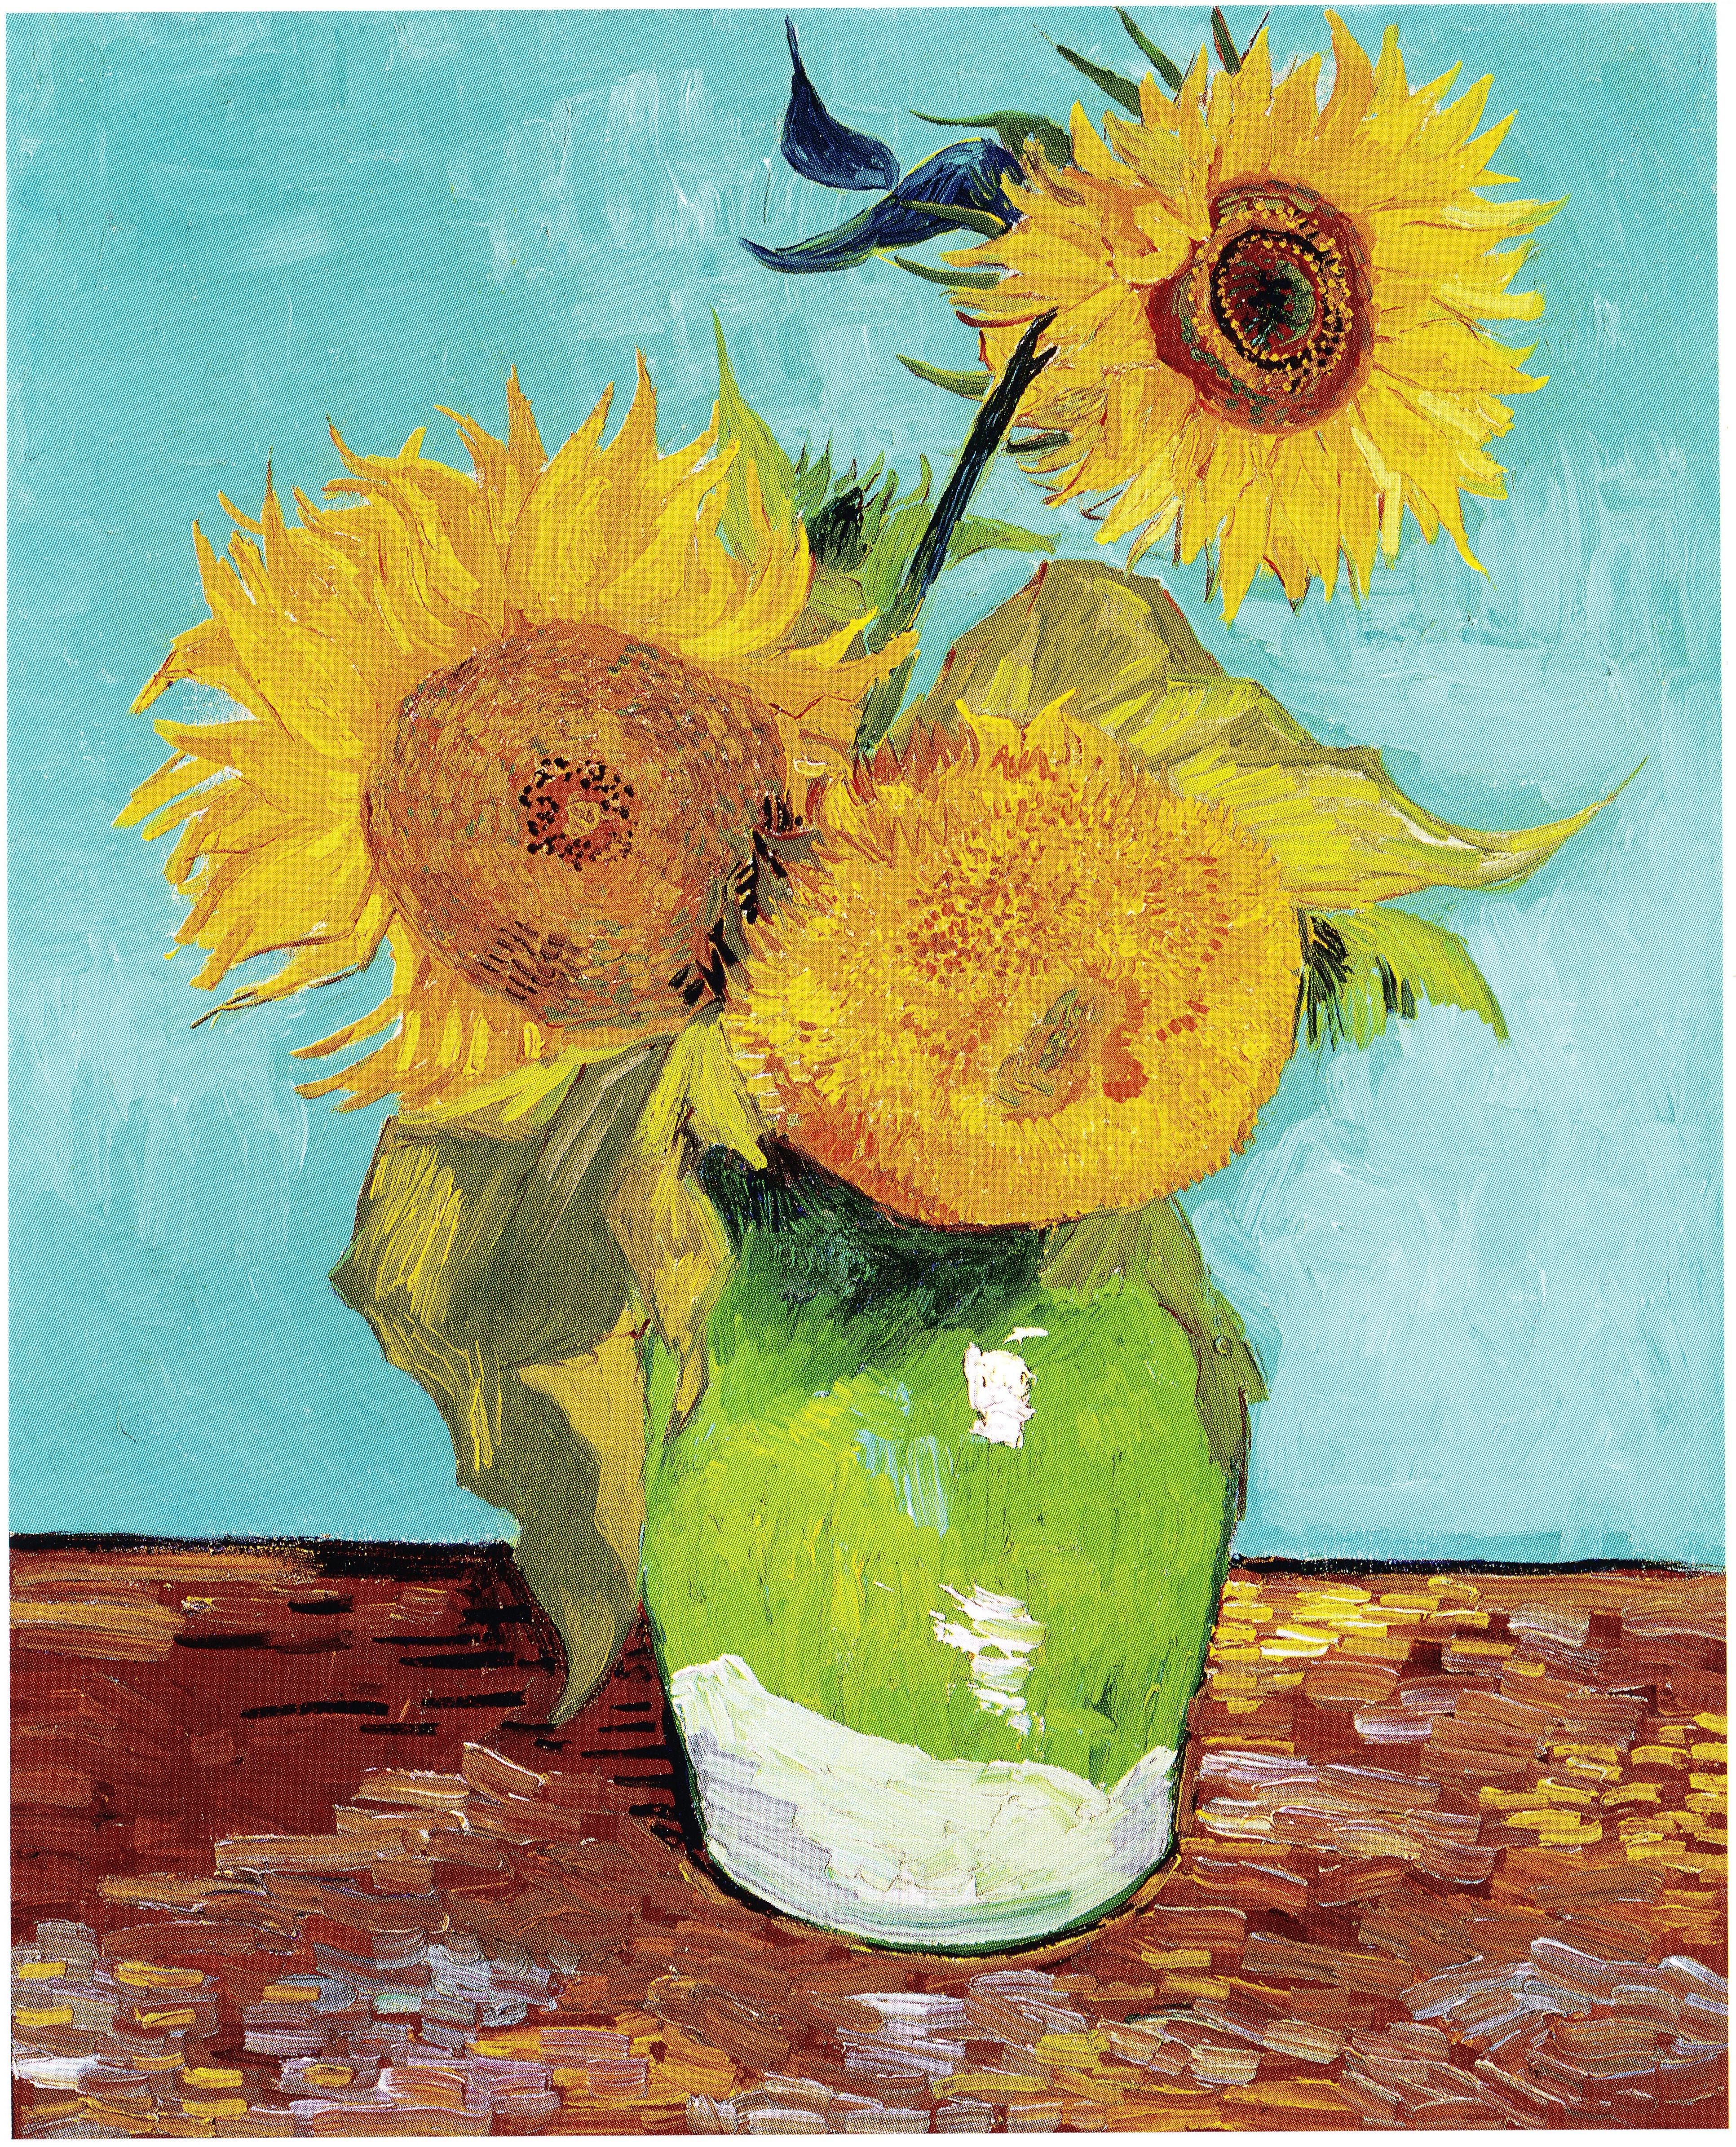 vincent van gogh vase with twelve sunflowers of saoborvincent van gogh three sunflowers f453 wikipadia intended for saoborvincent van gogh three sunflowers f453